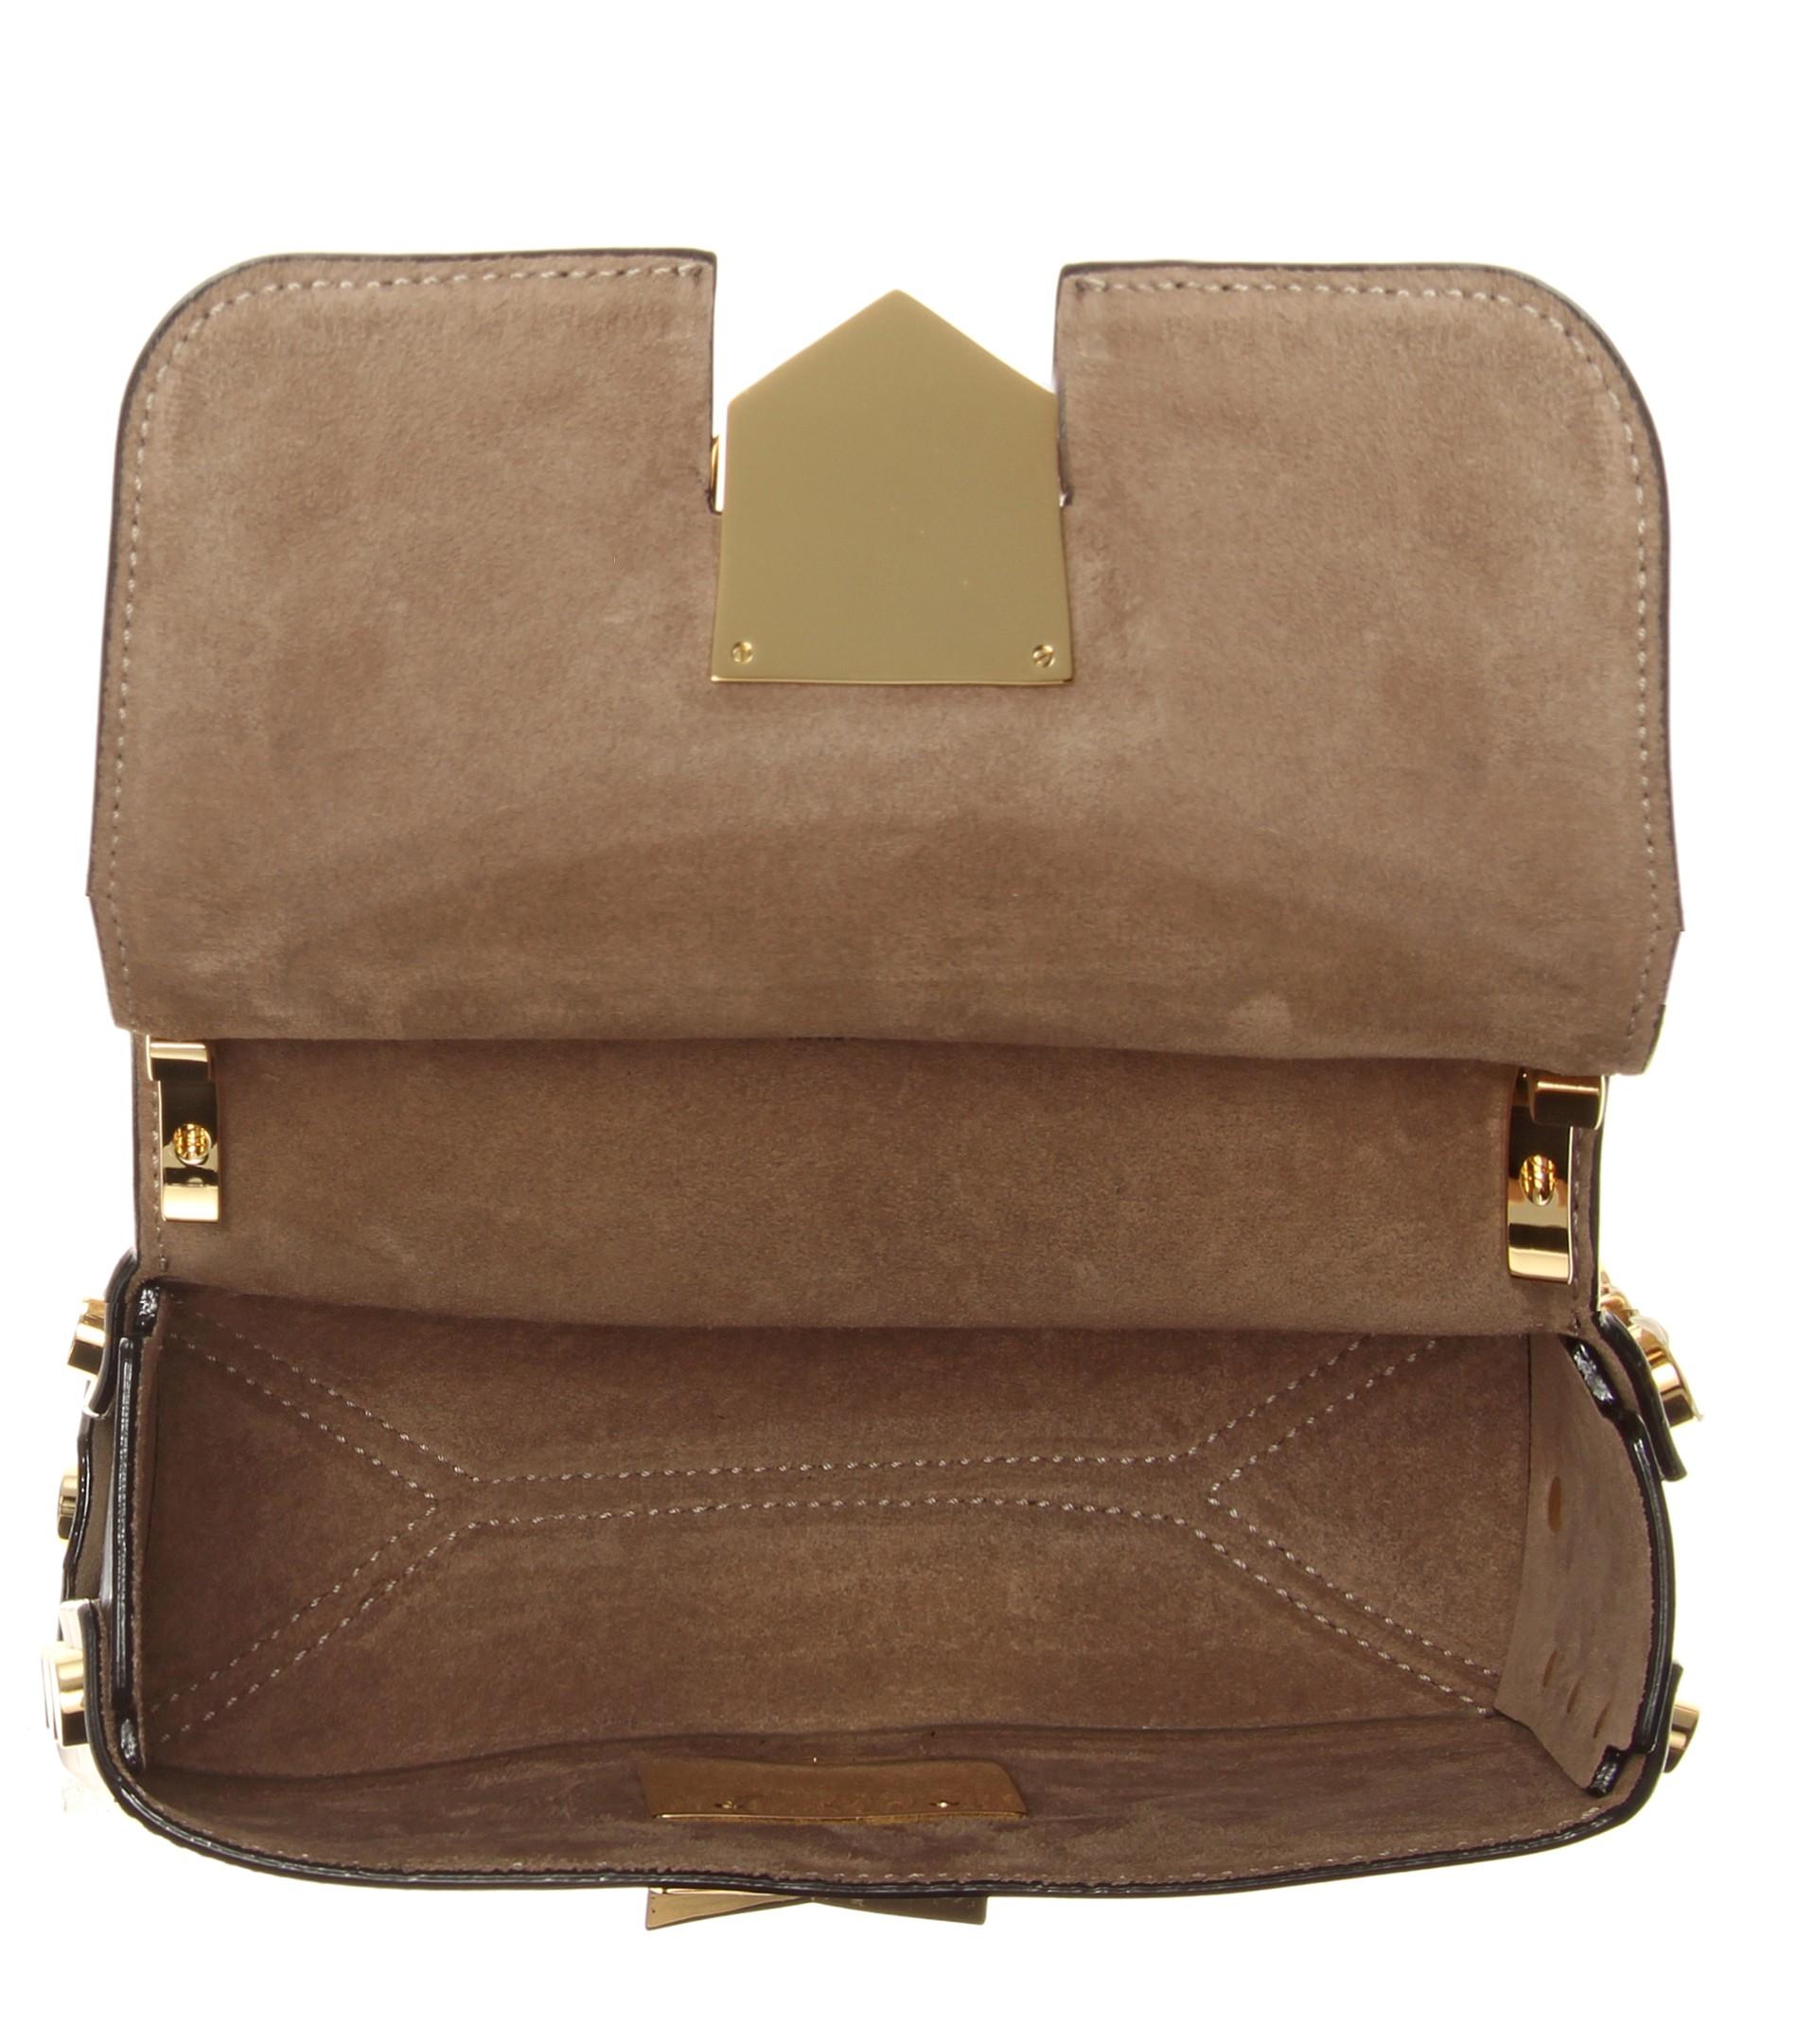 47b95be992b4 Lyst - Jimmy Choo Lockett Petite Leather Shoulder Bag in Black